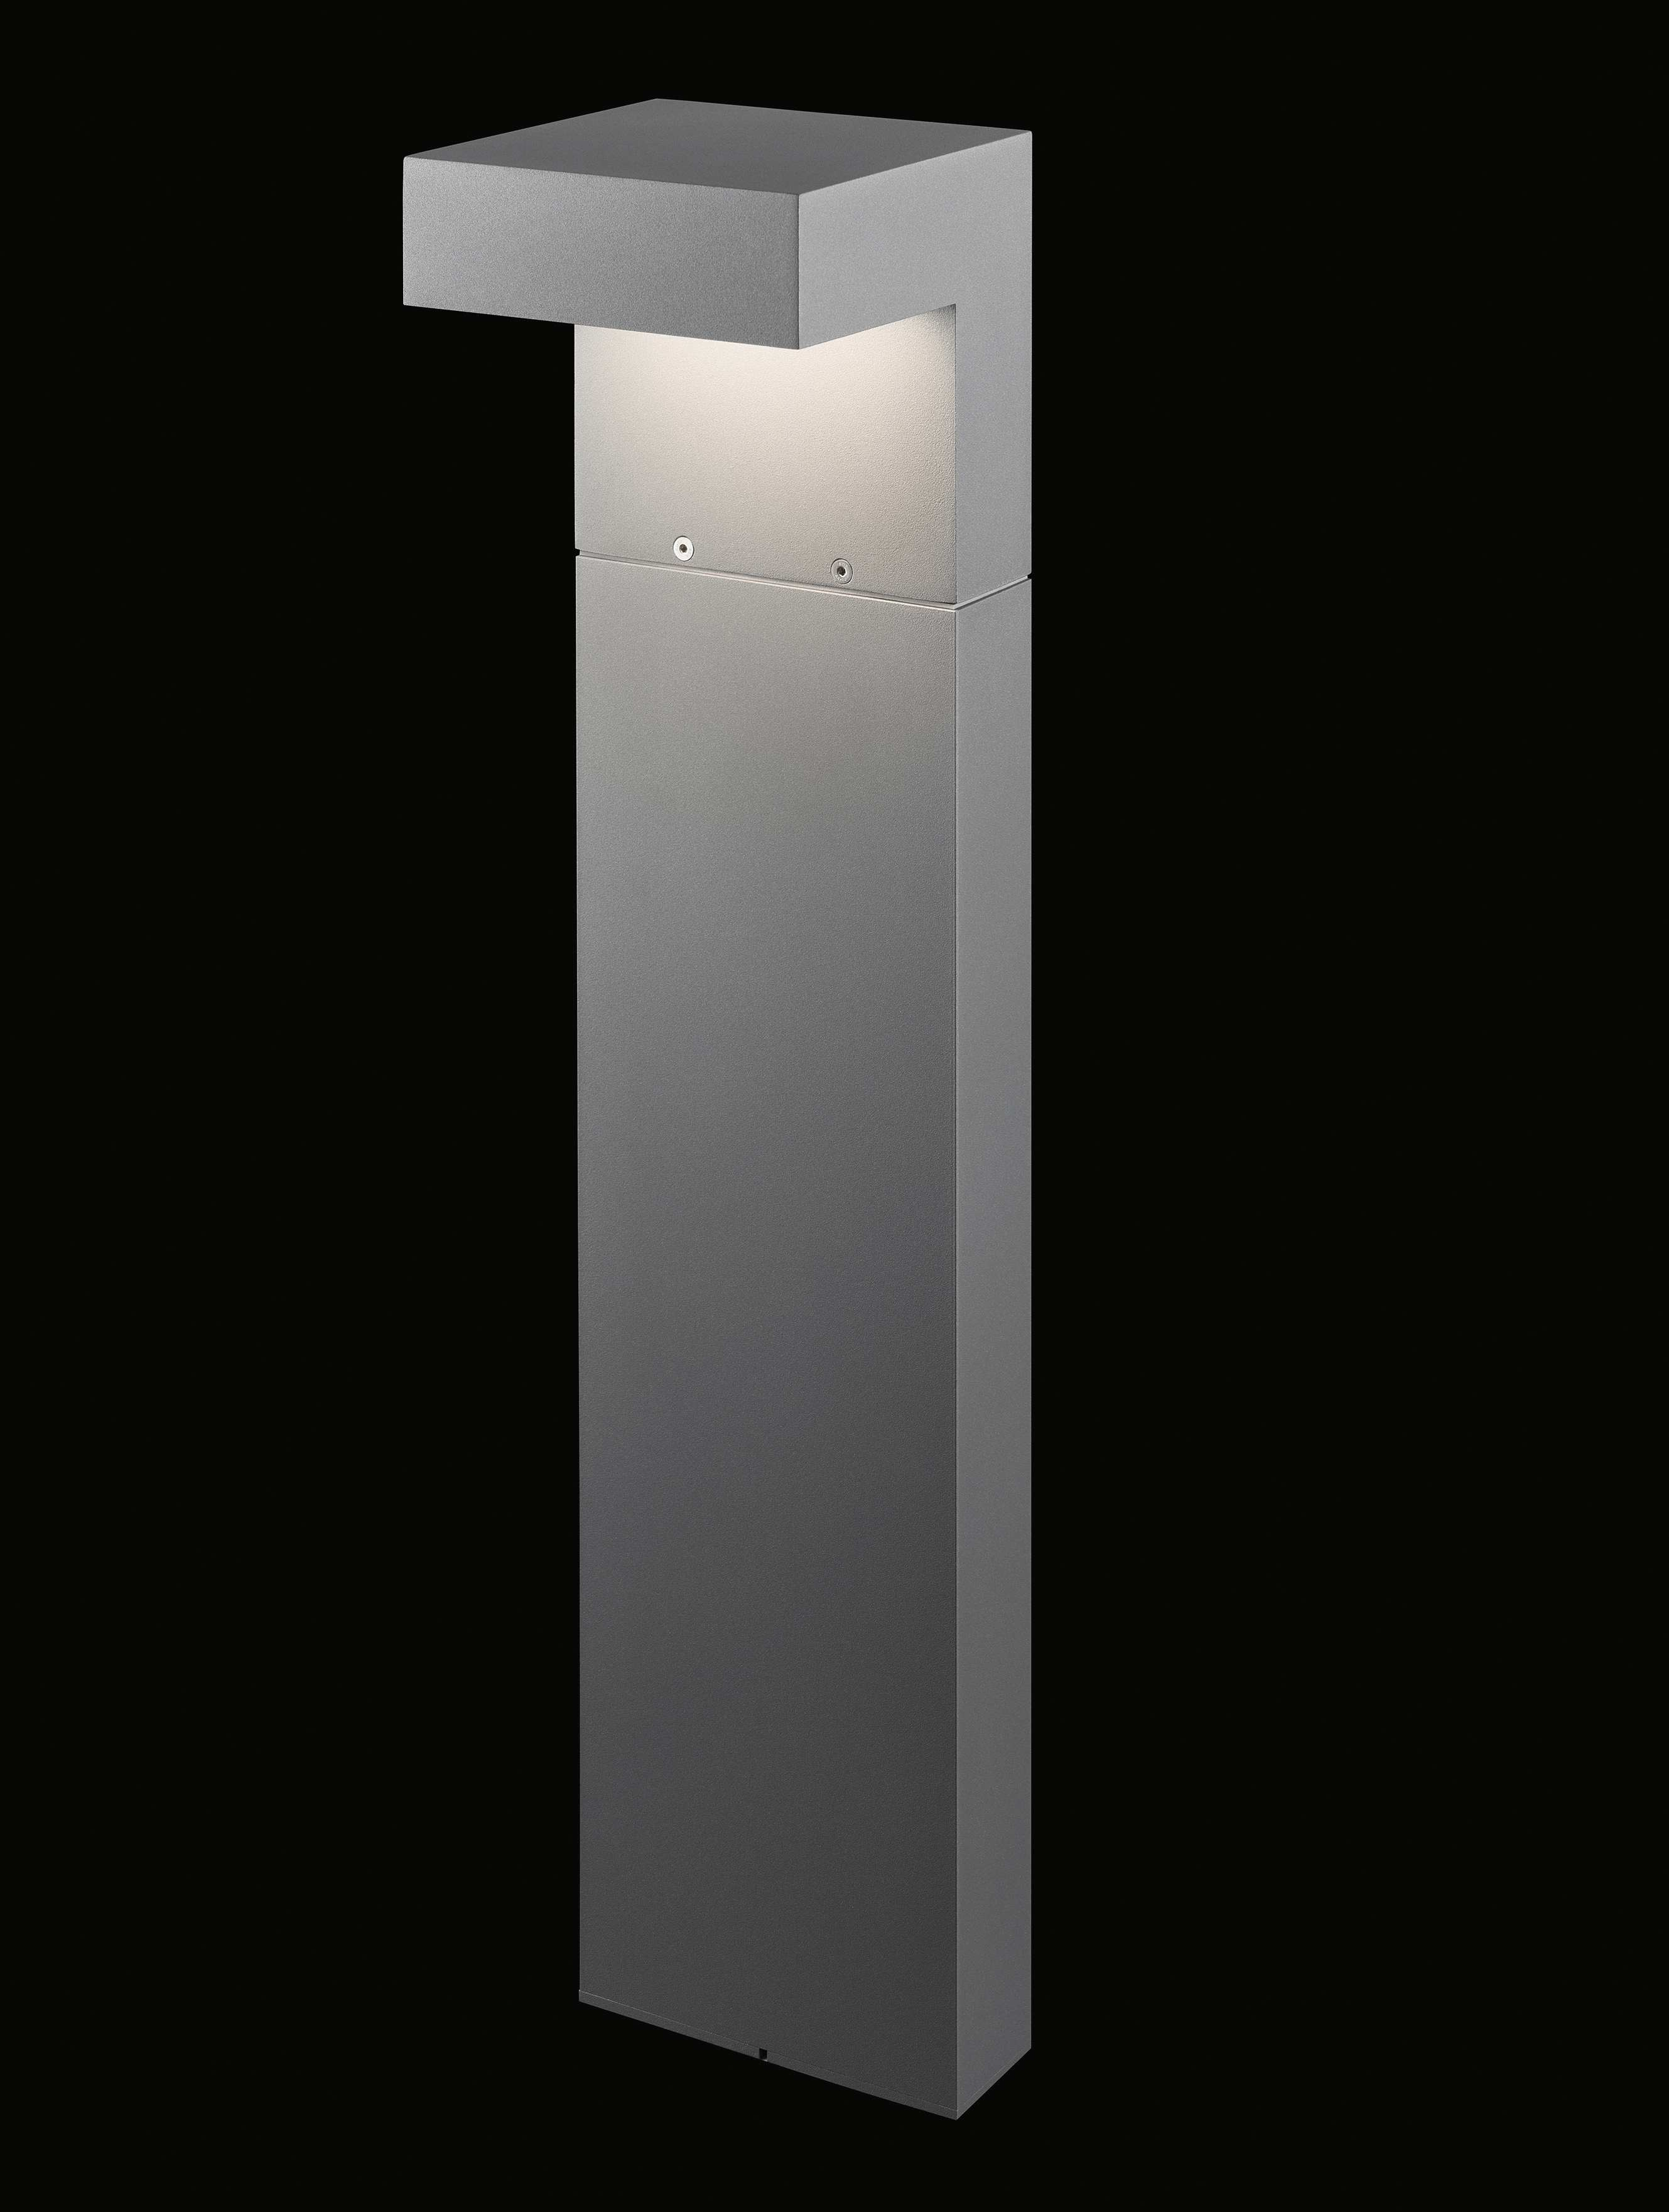 Nimbus corpi illuminanti per ambienti esterni versatili for Corpi illuminanti led